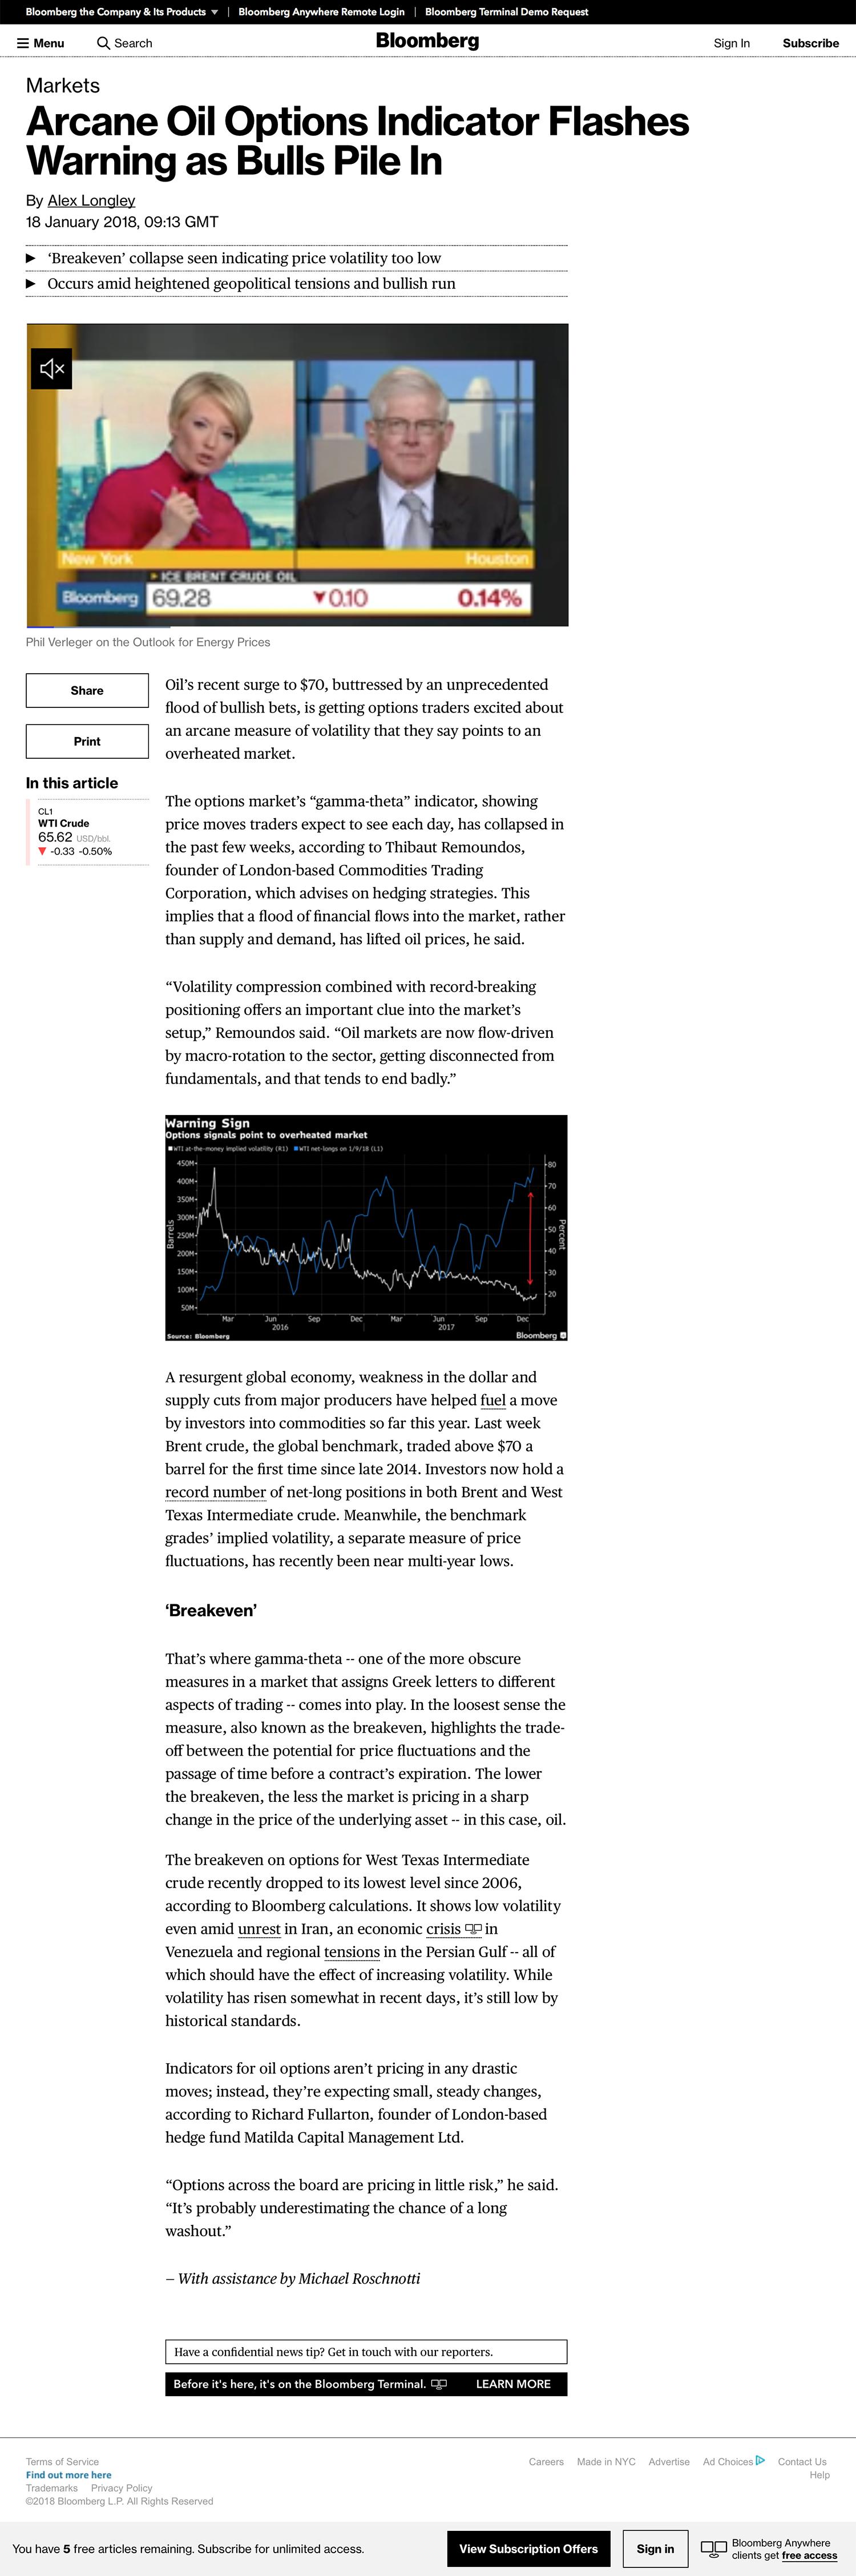 Press - Commodities Trading Corporation